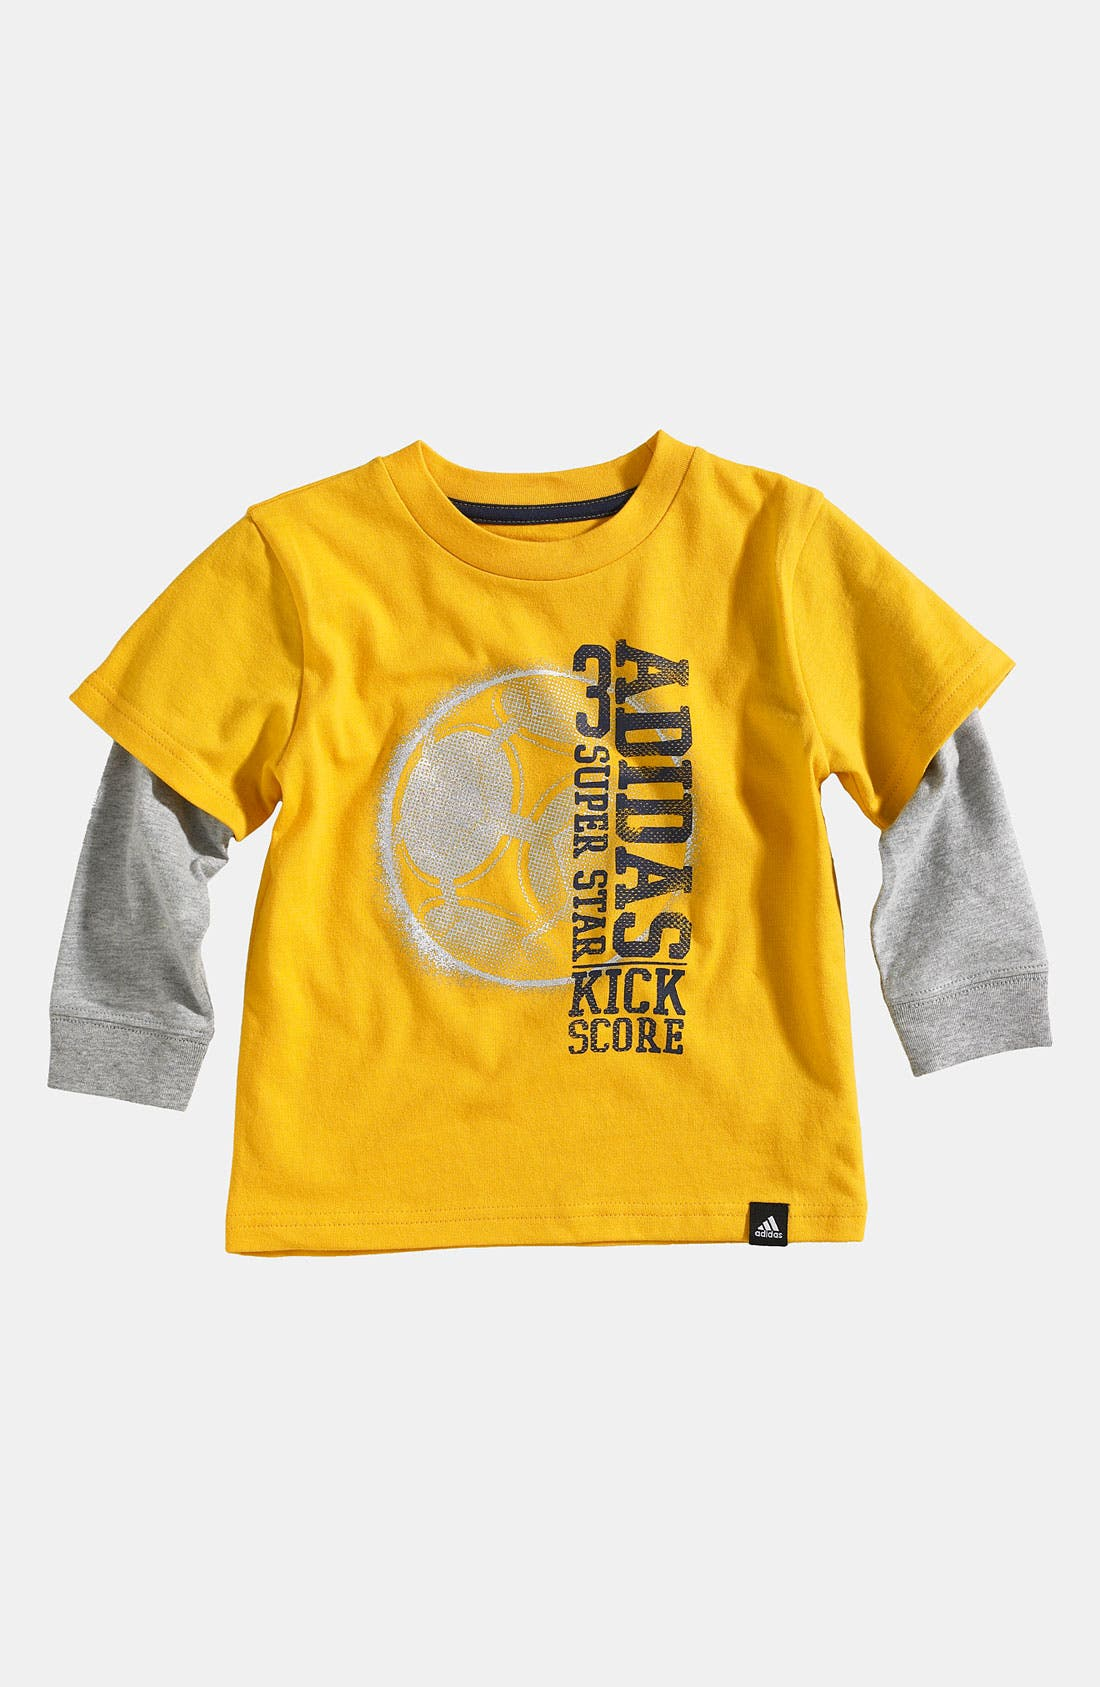 Alternate Image 1 Selected - adidas 'Triple Score' T-Shirt (Toddler)